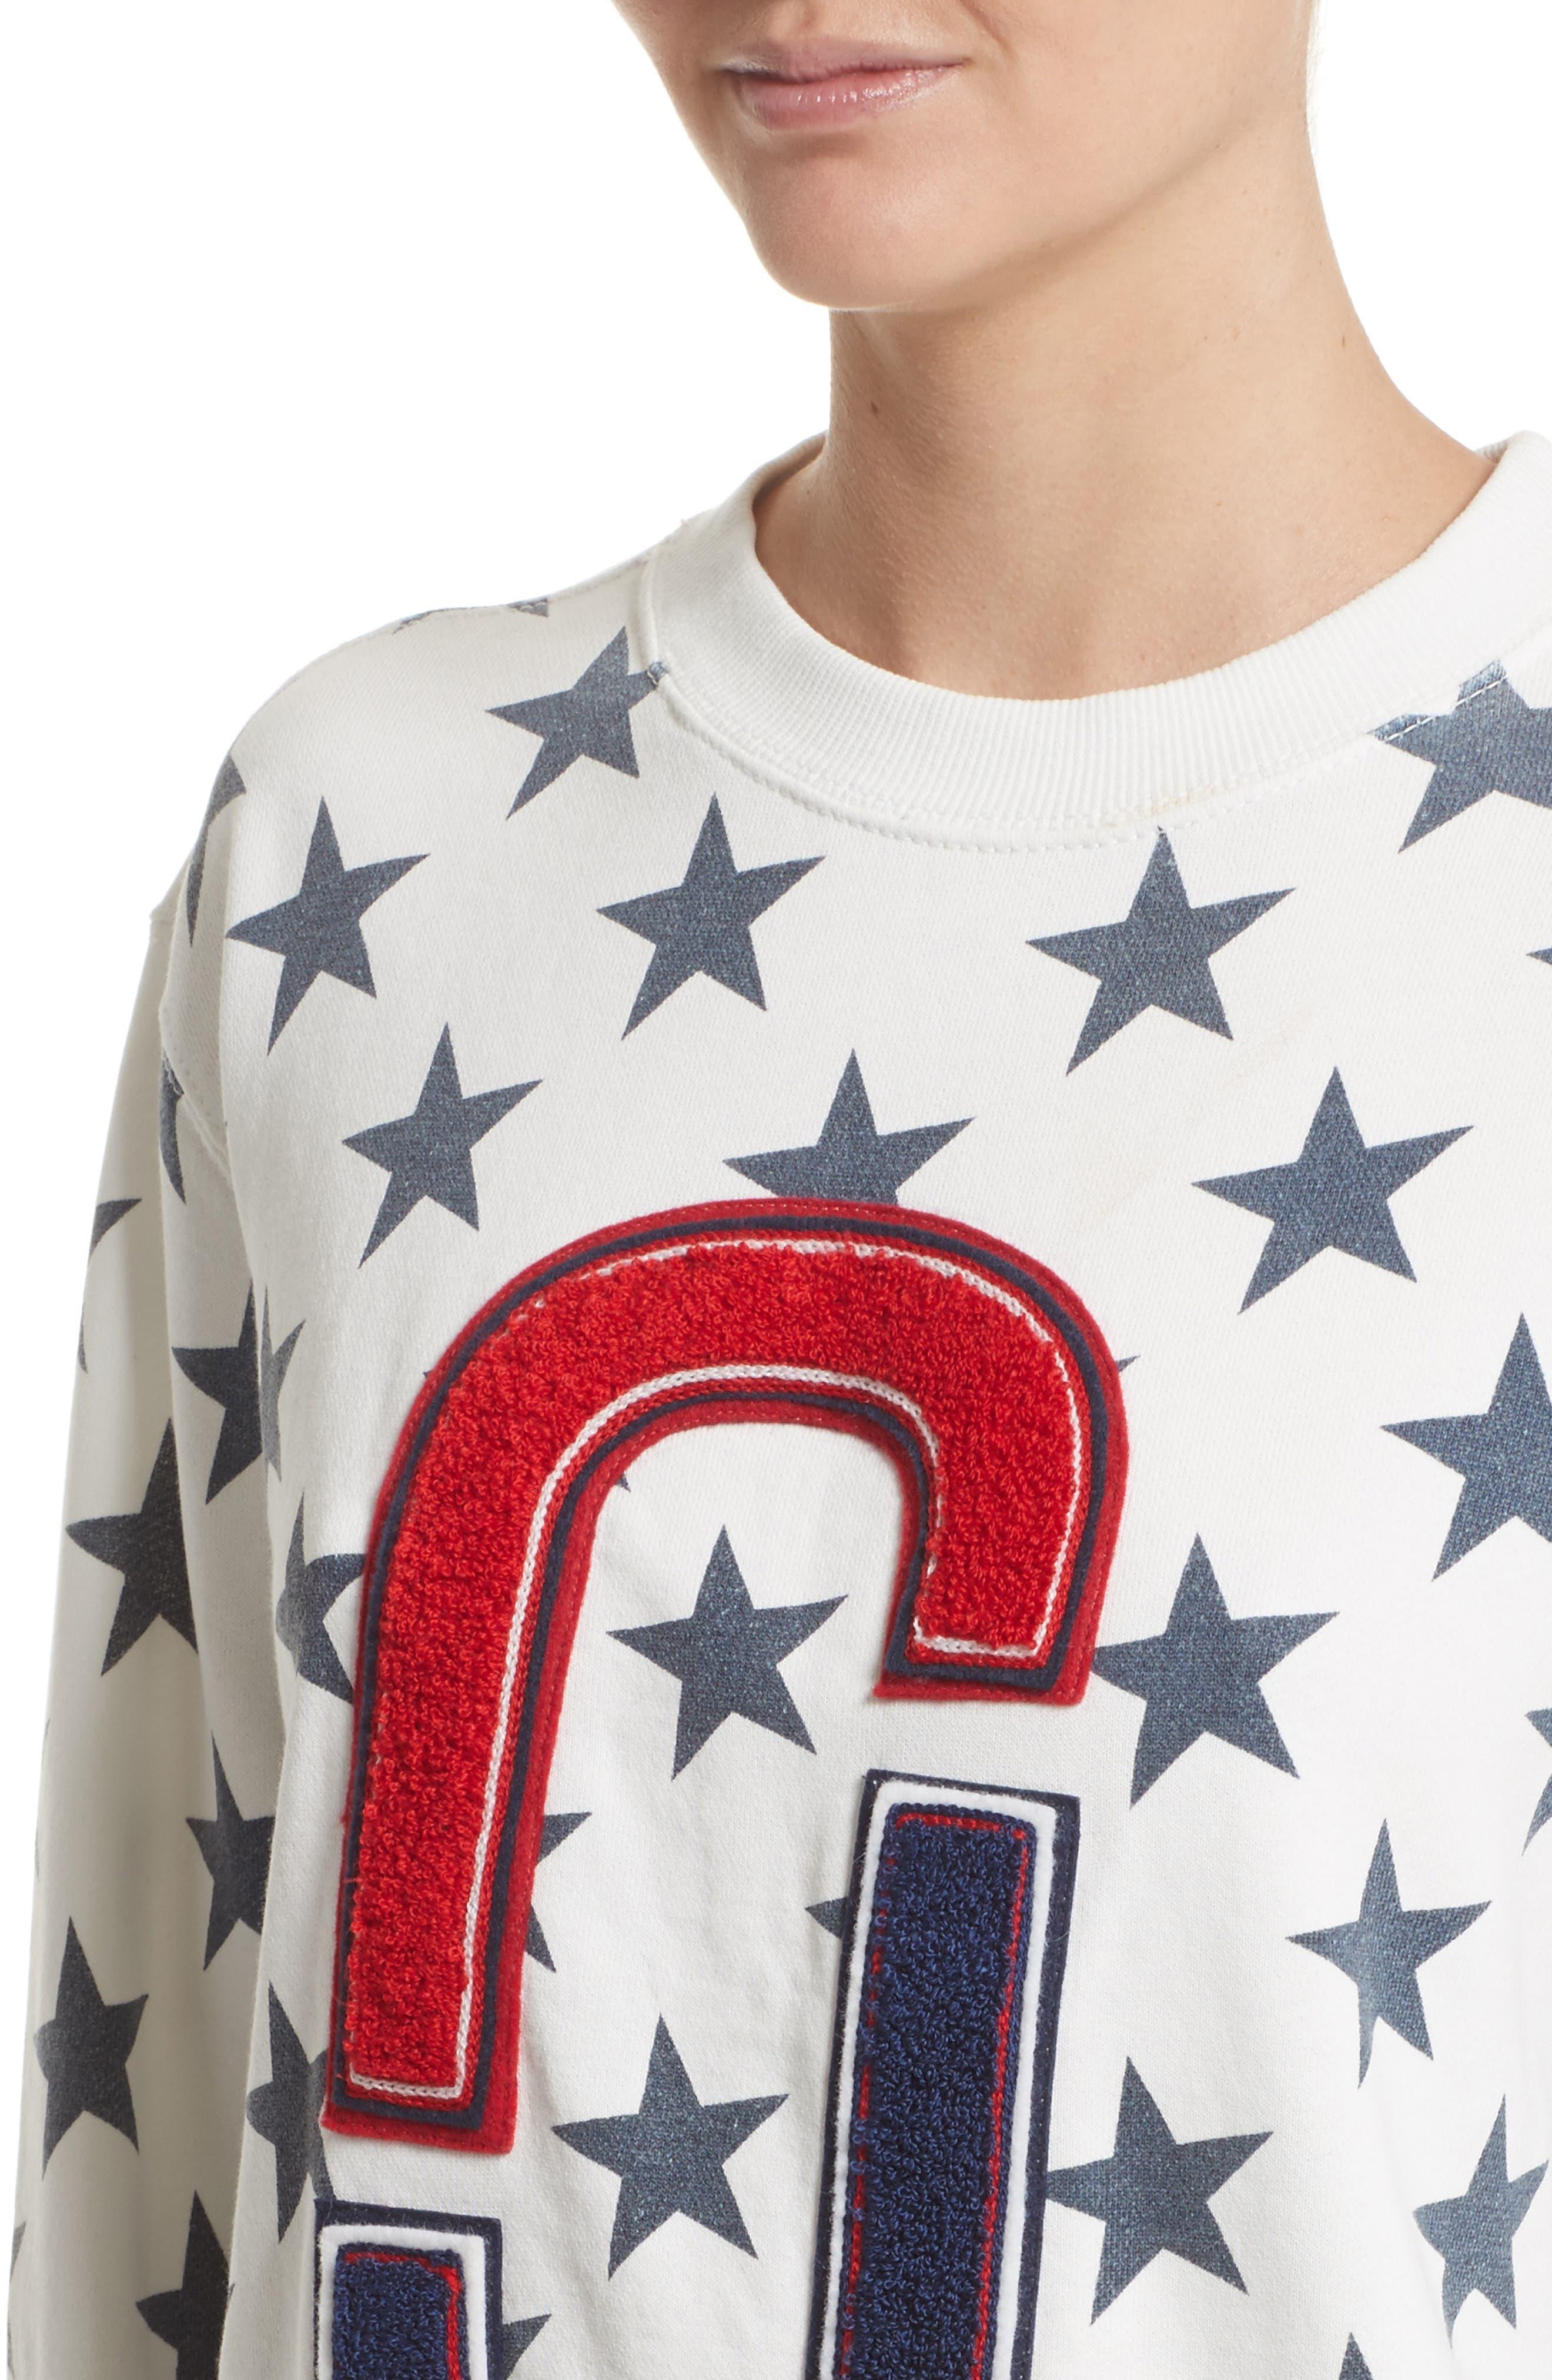 '90s Star Print Sweatshirt,                             Alternate thumbnail 4, color,                             900